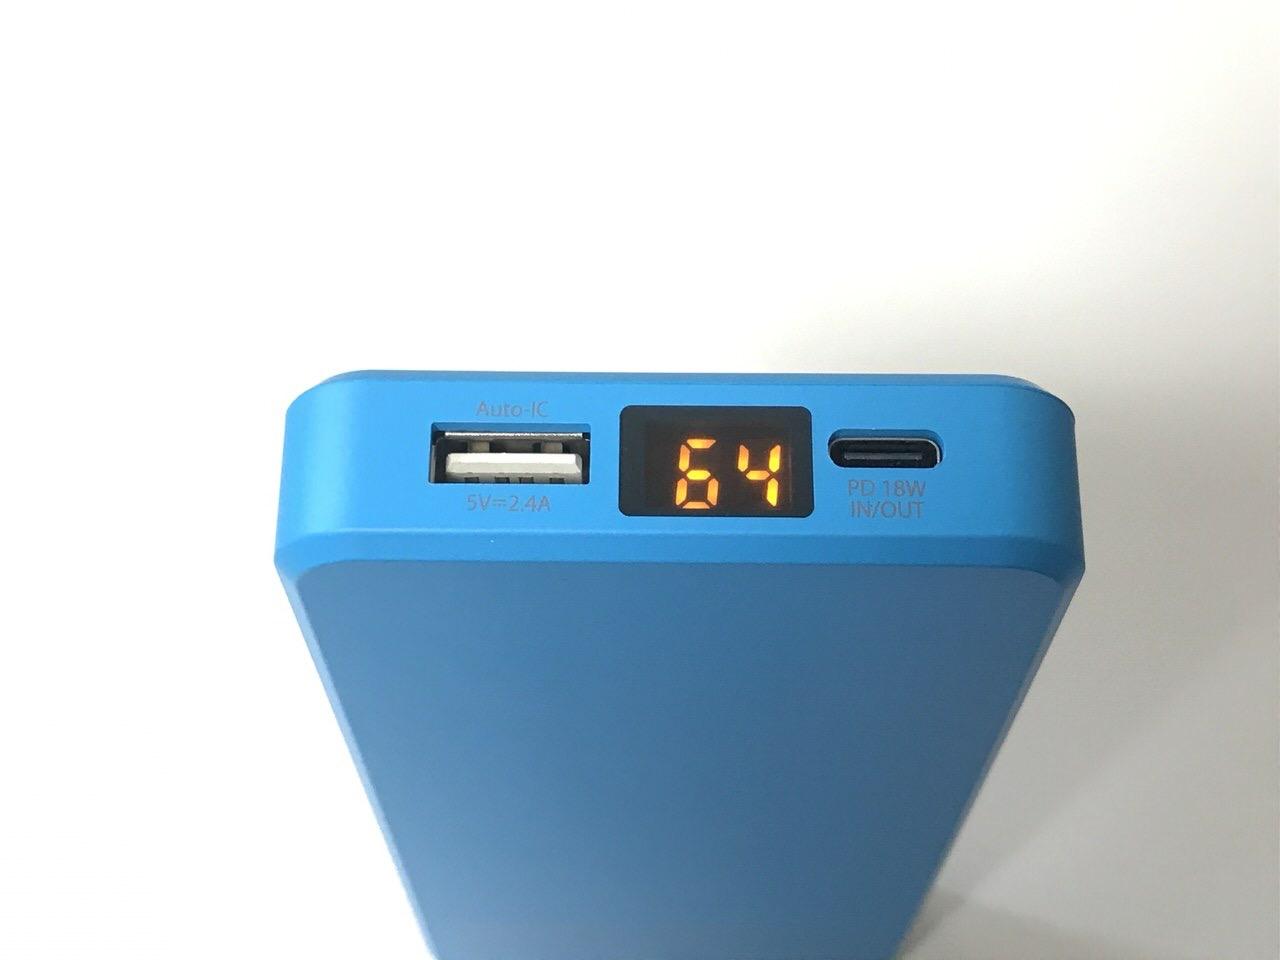 PD対応薄型の10,000mAhモバイルバッテリー「cheero Stream 10000mAh with Power Delivery 18W」バッテリー残量も1%刻みで分かりやすい!